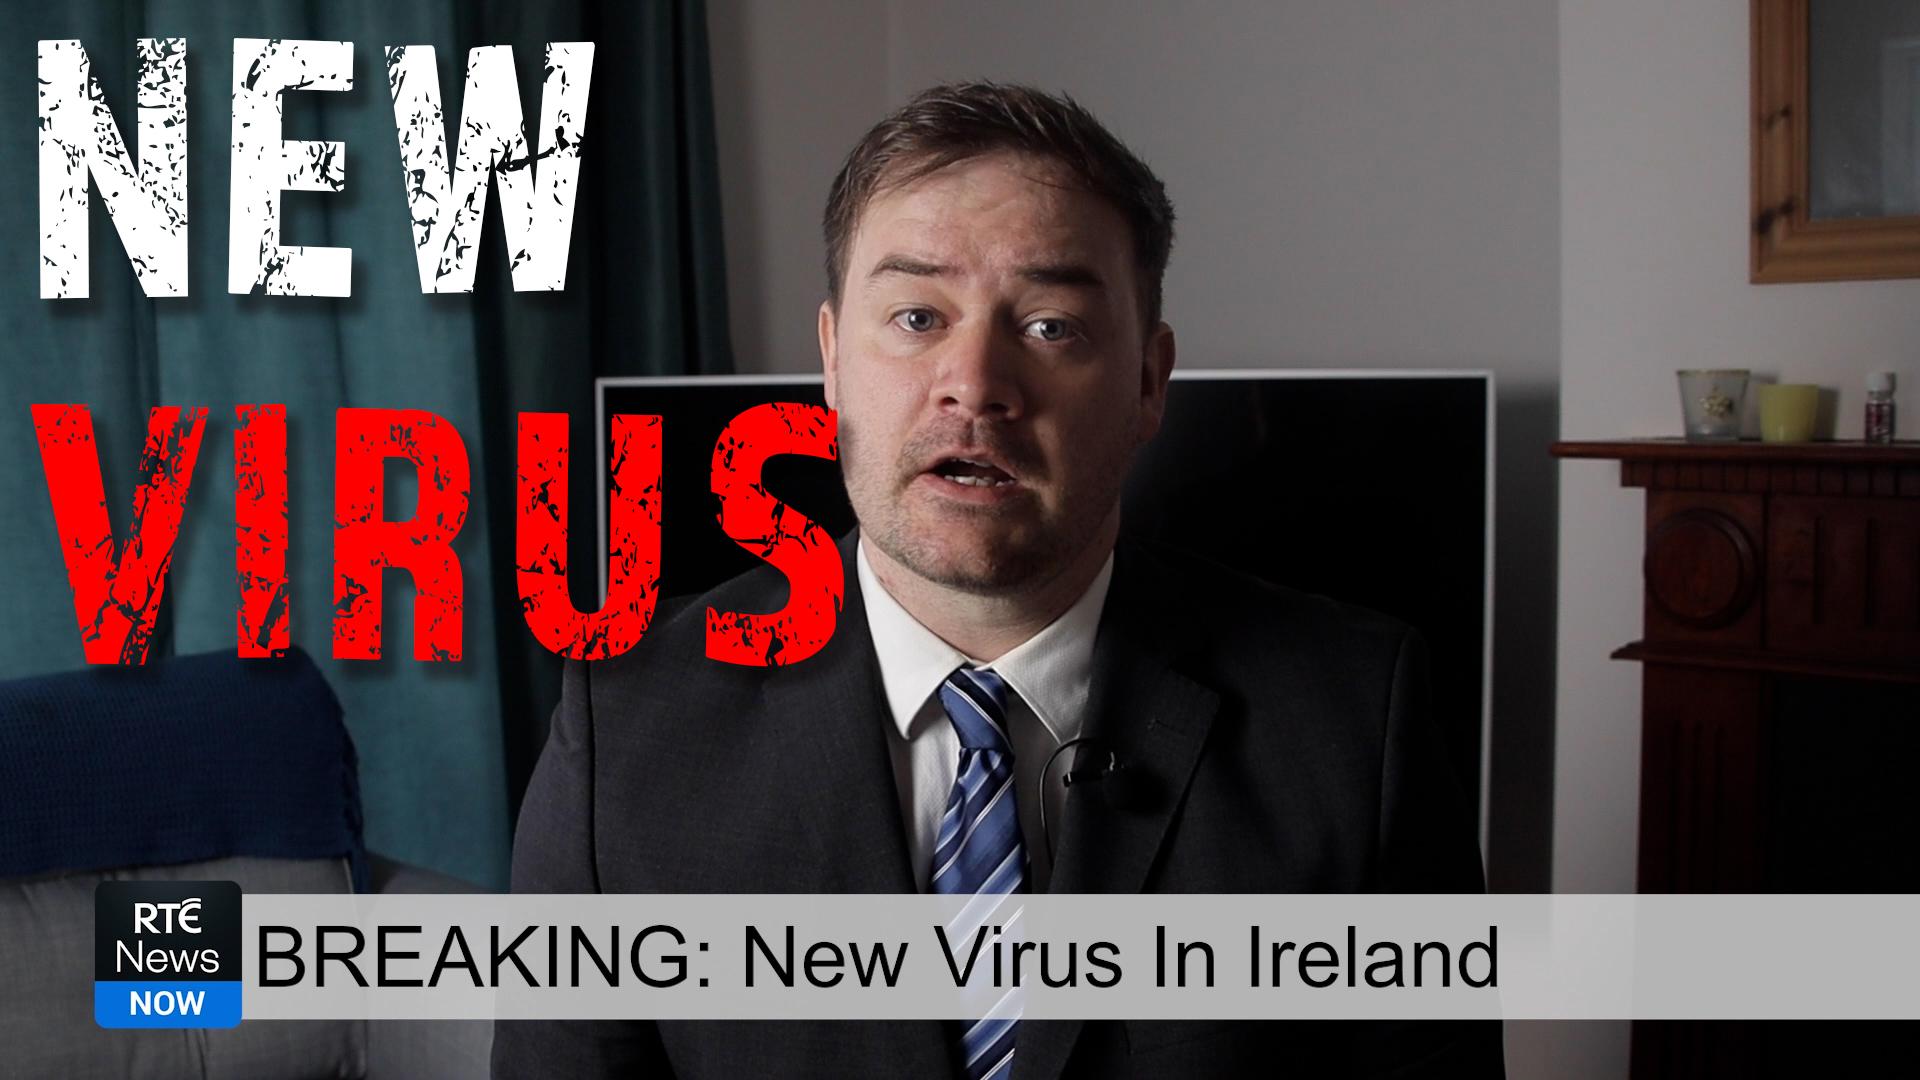 New virus Ireland